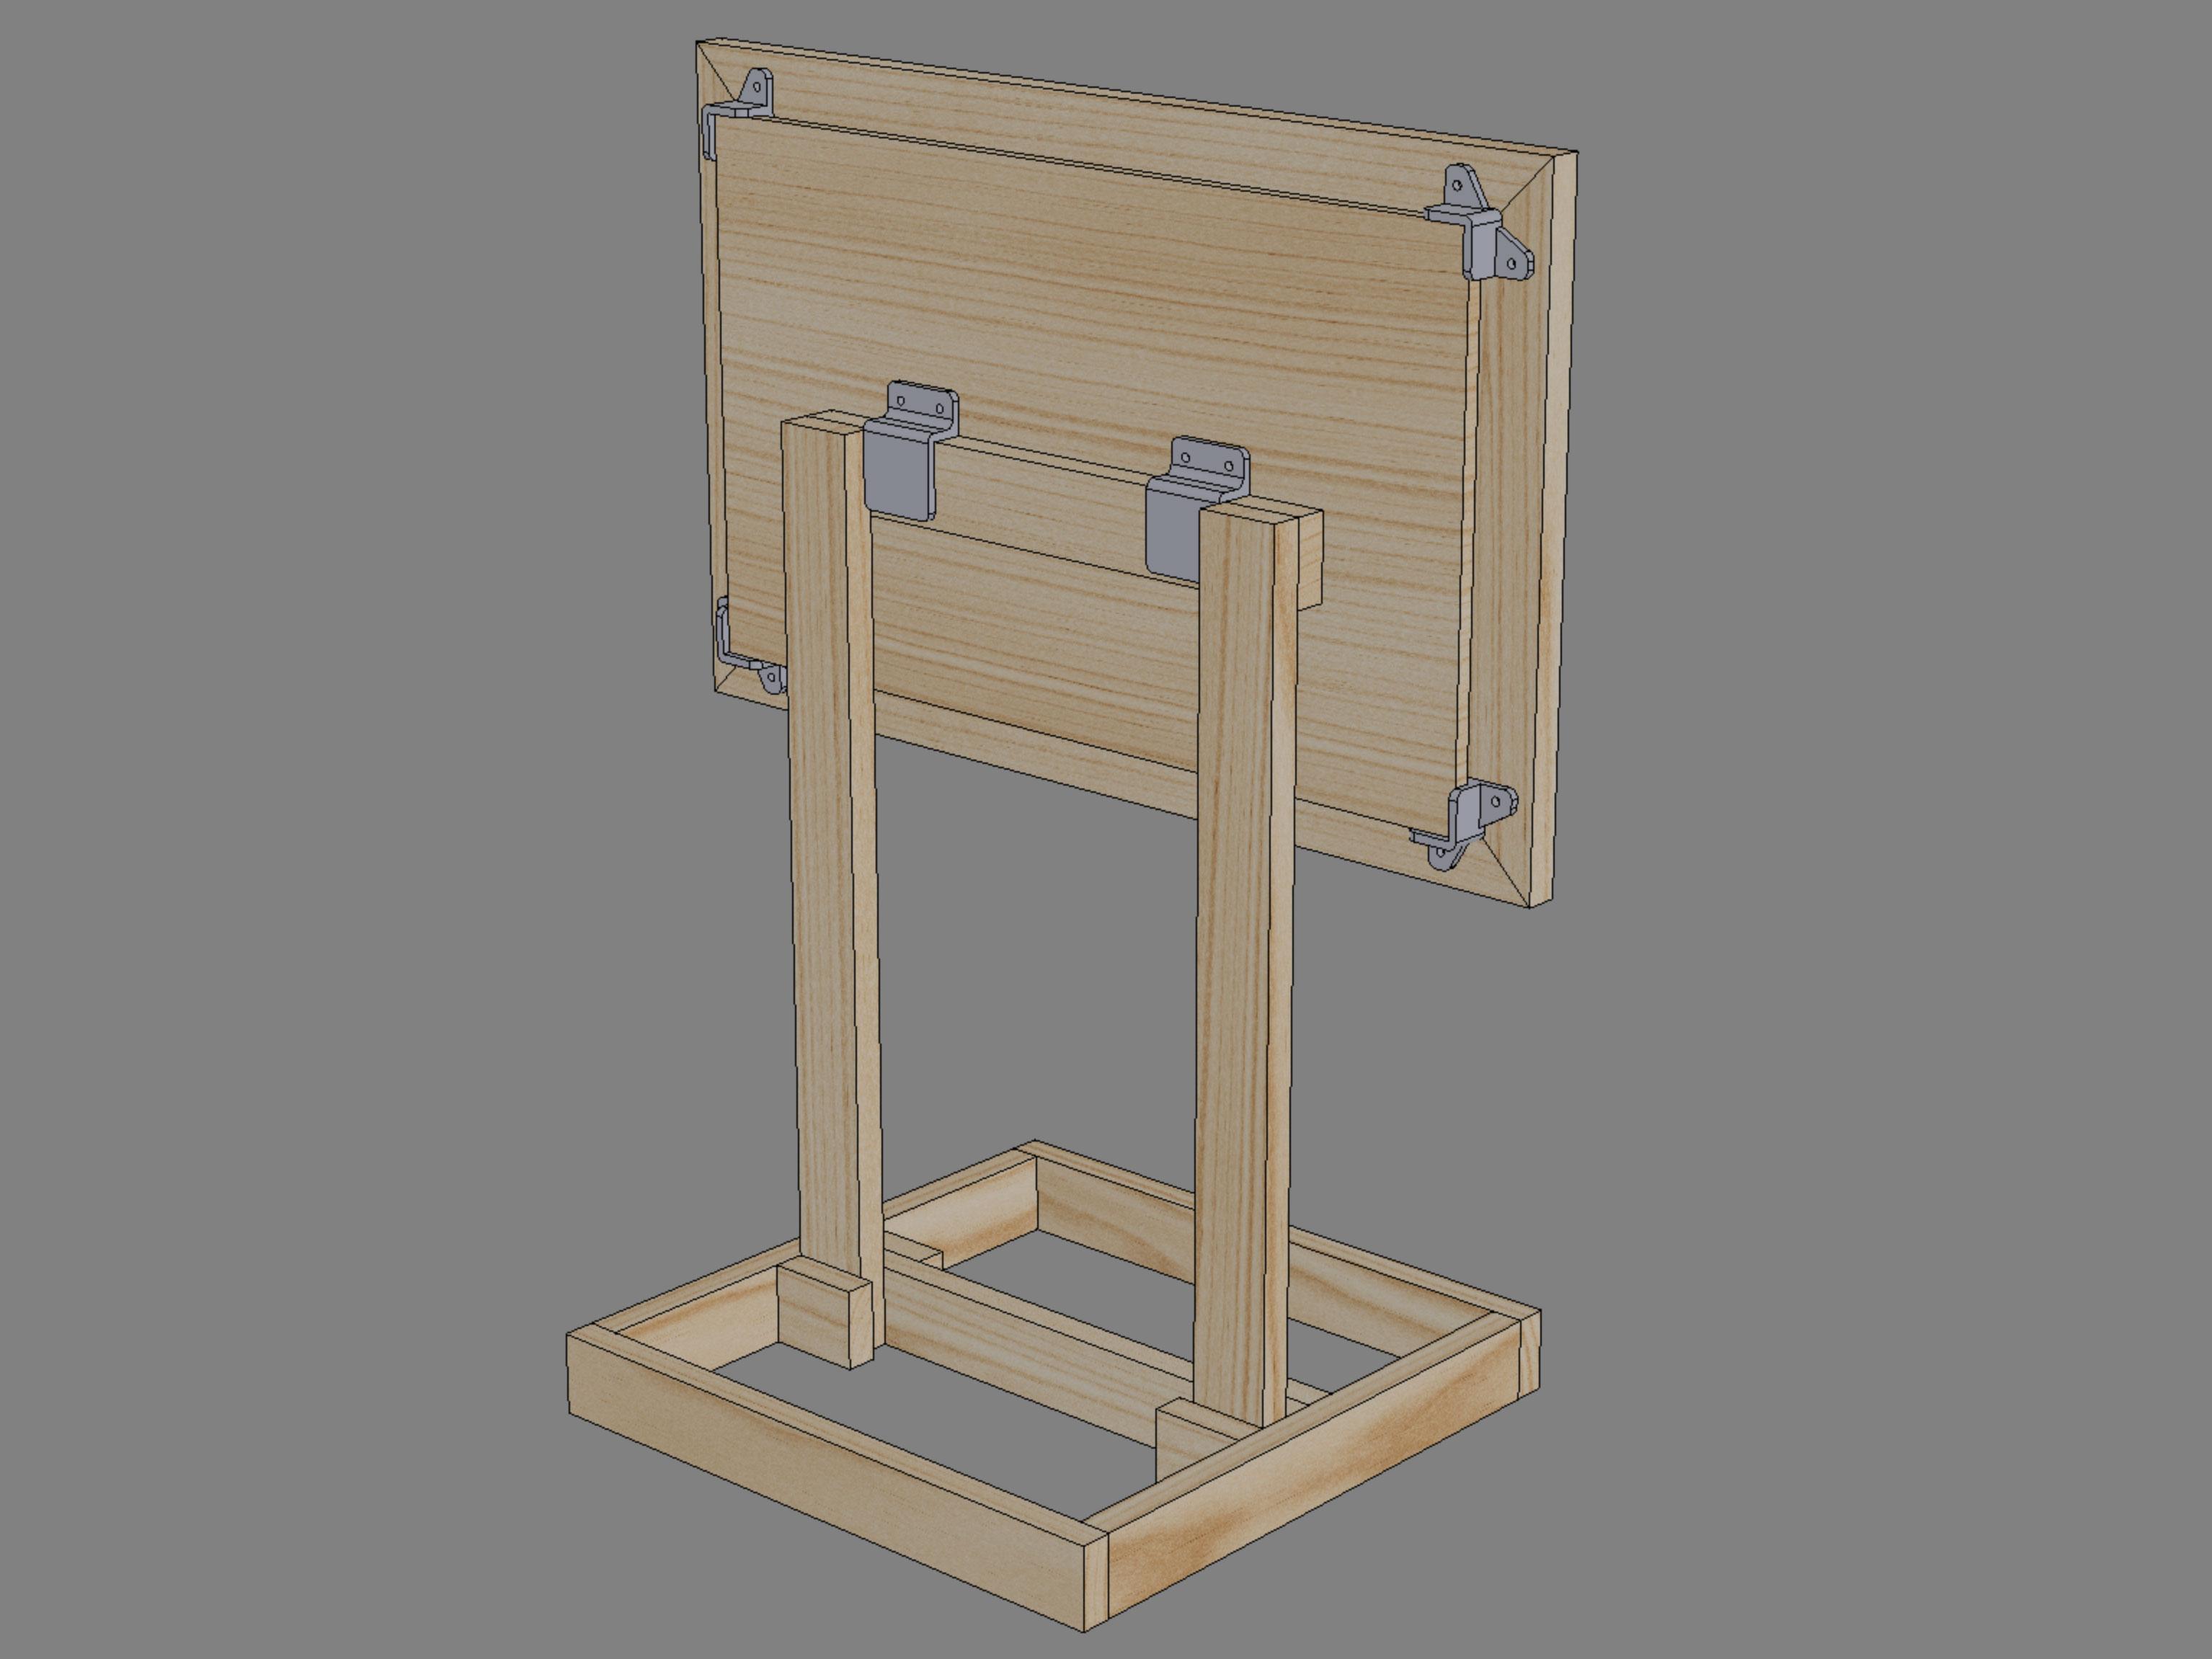 3d_printing_sign-step-8.jpg